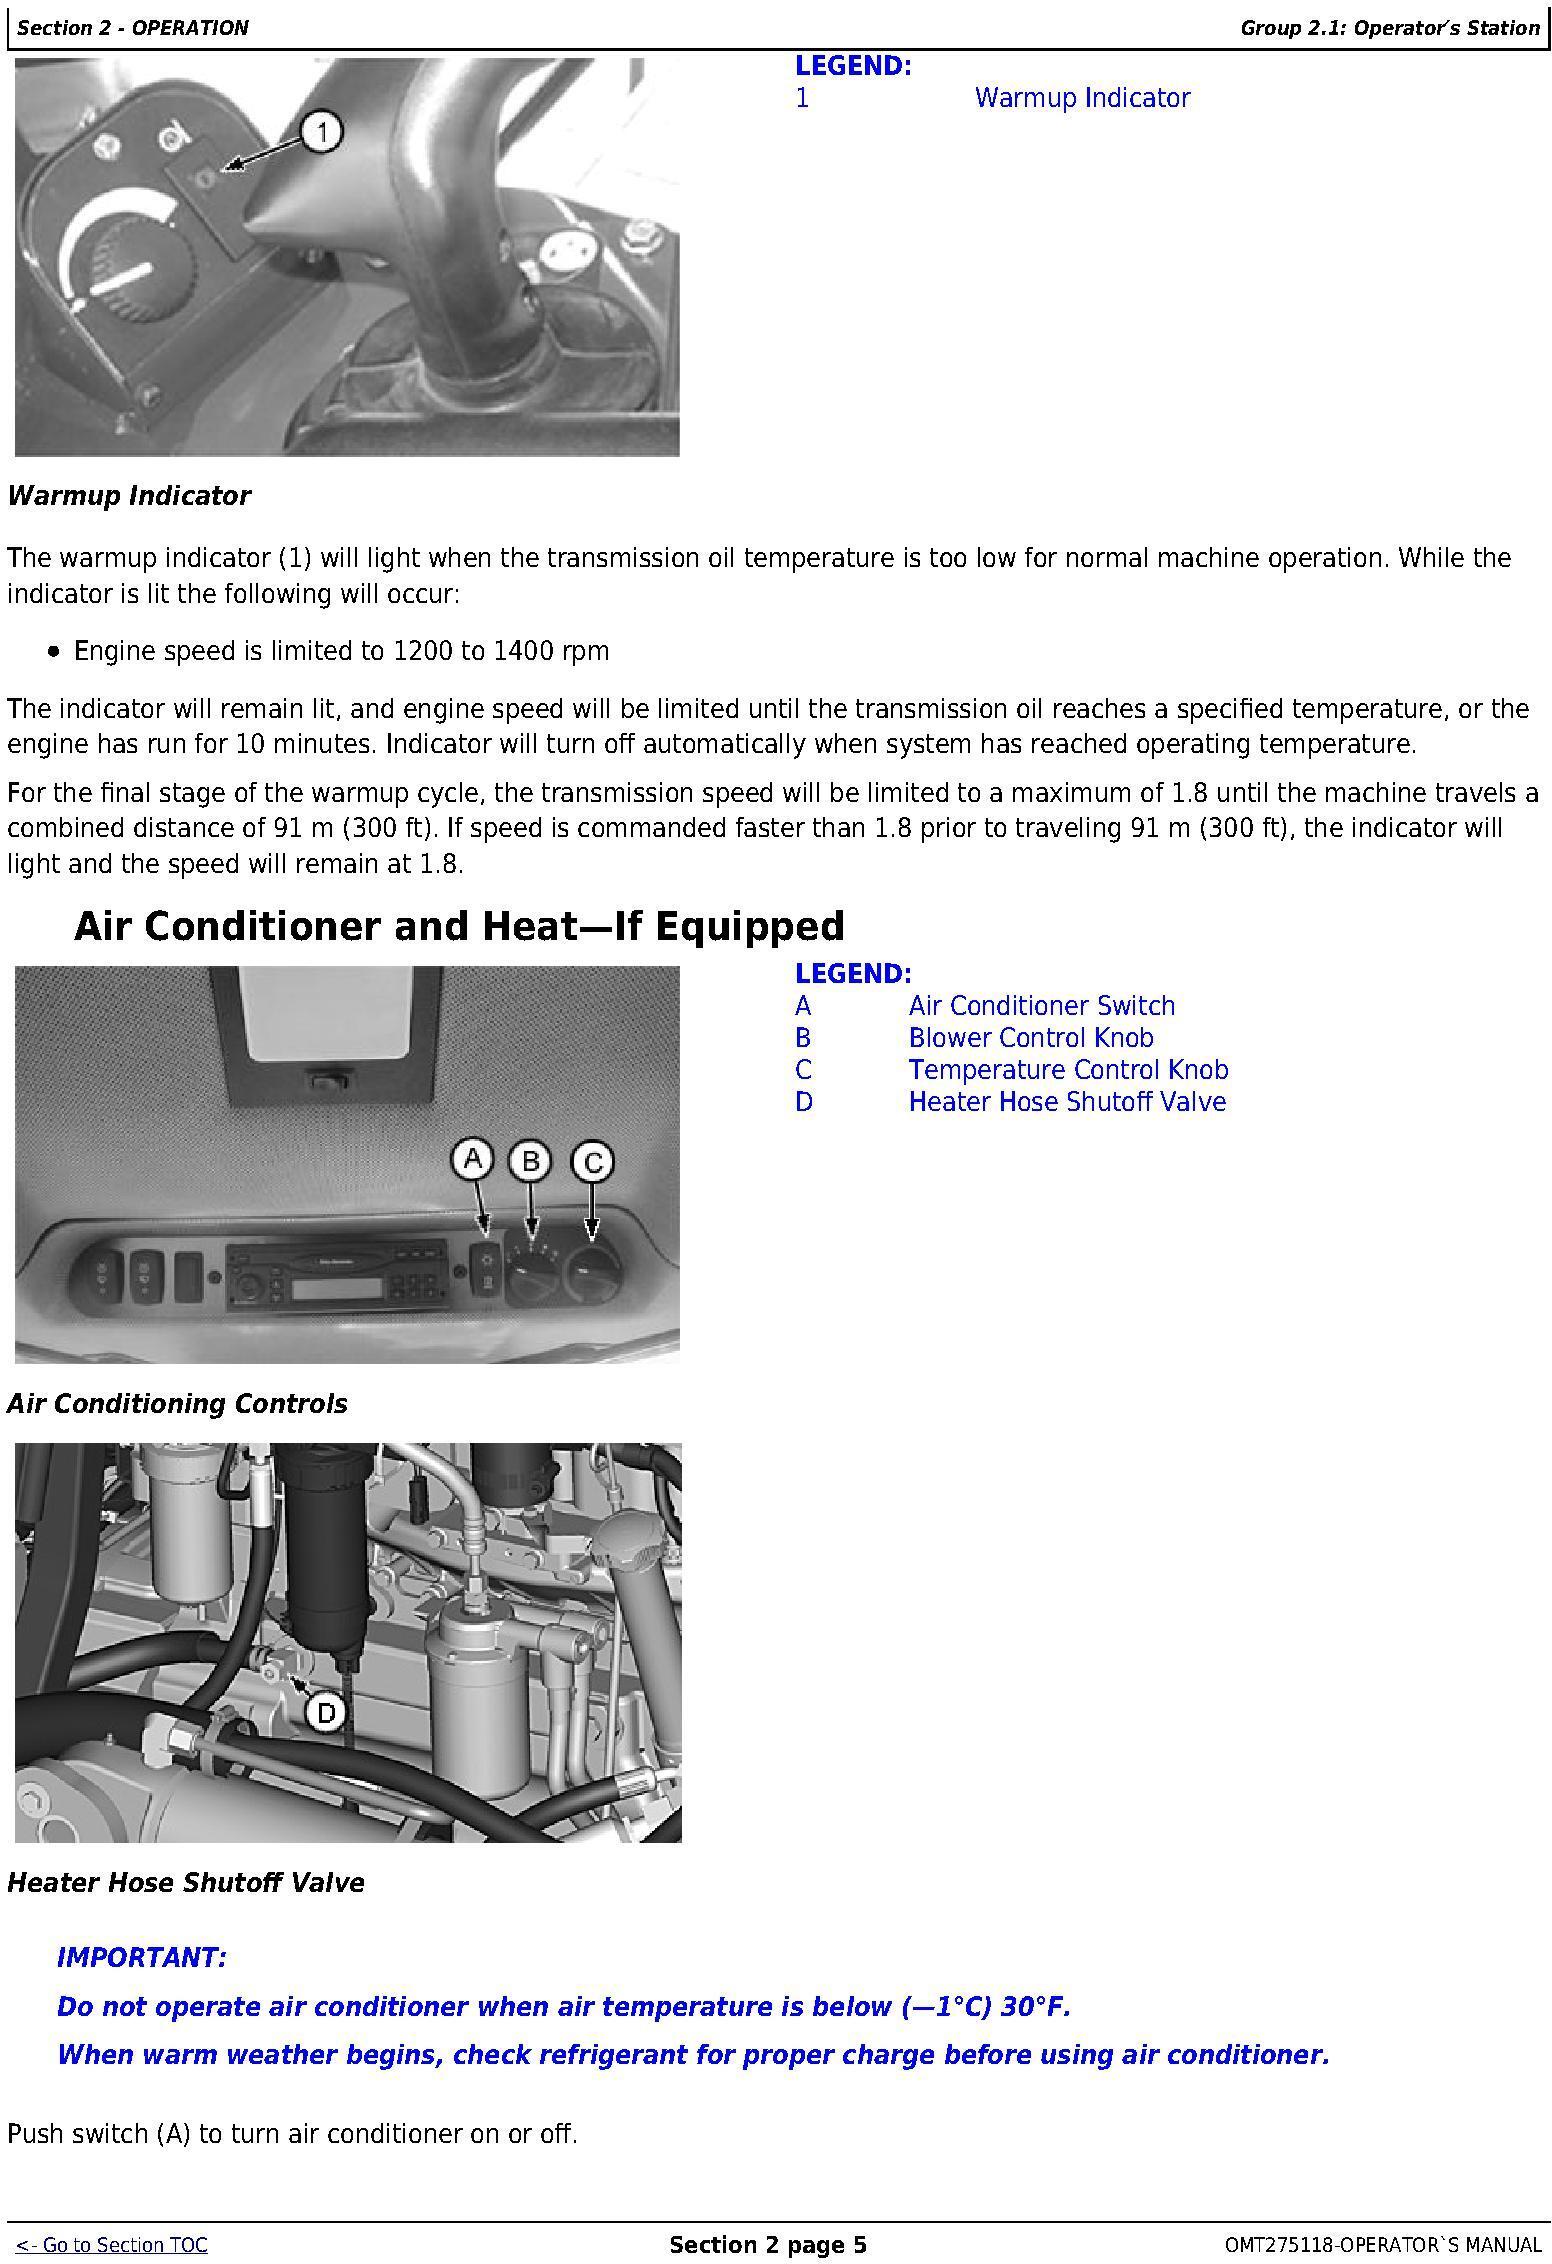 OMT275118 - John Deere 850J Crawler Dozer (PIN: 1T0850JX**C216392-) Operator's Manual - 2